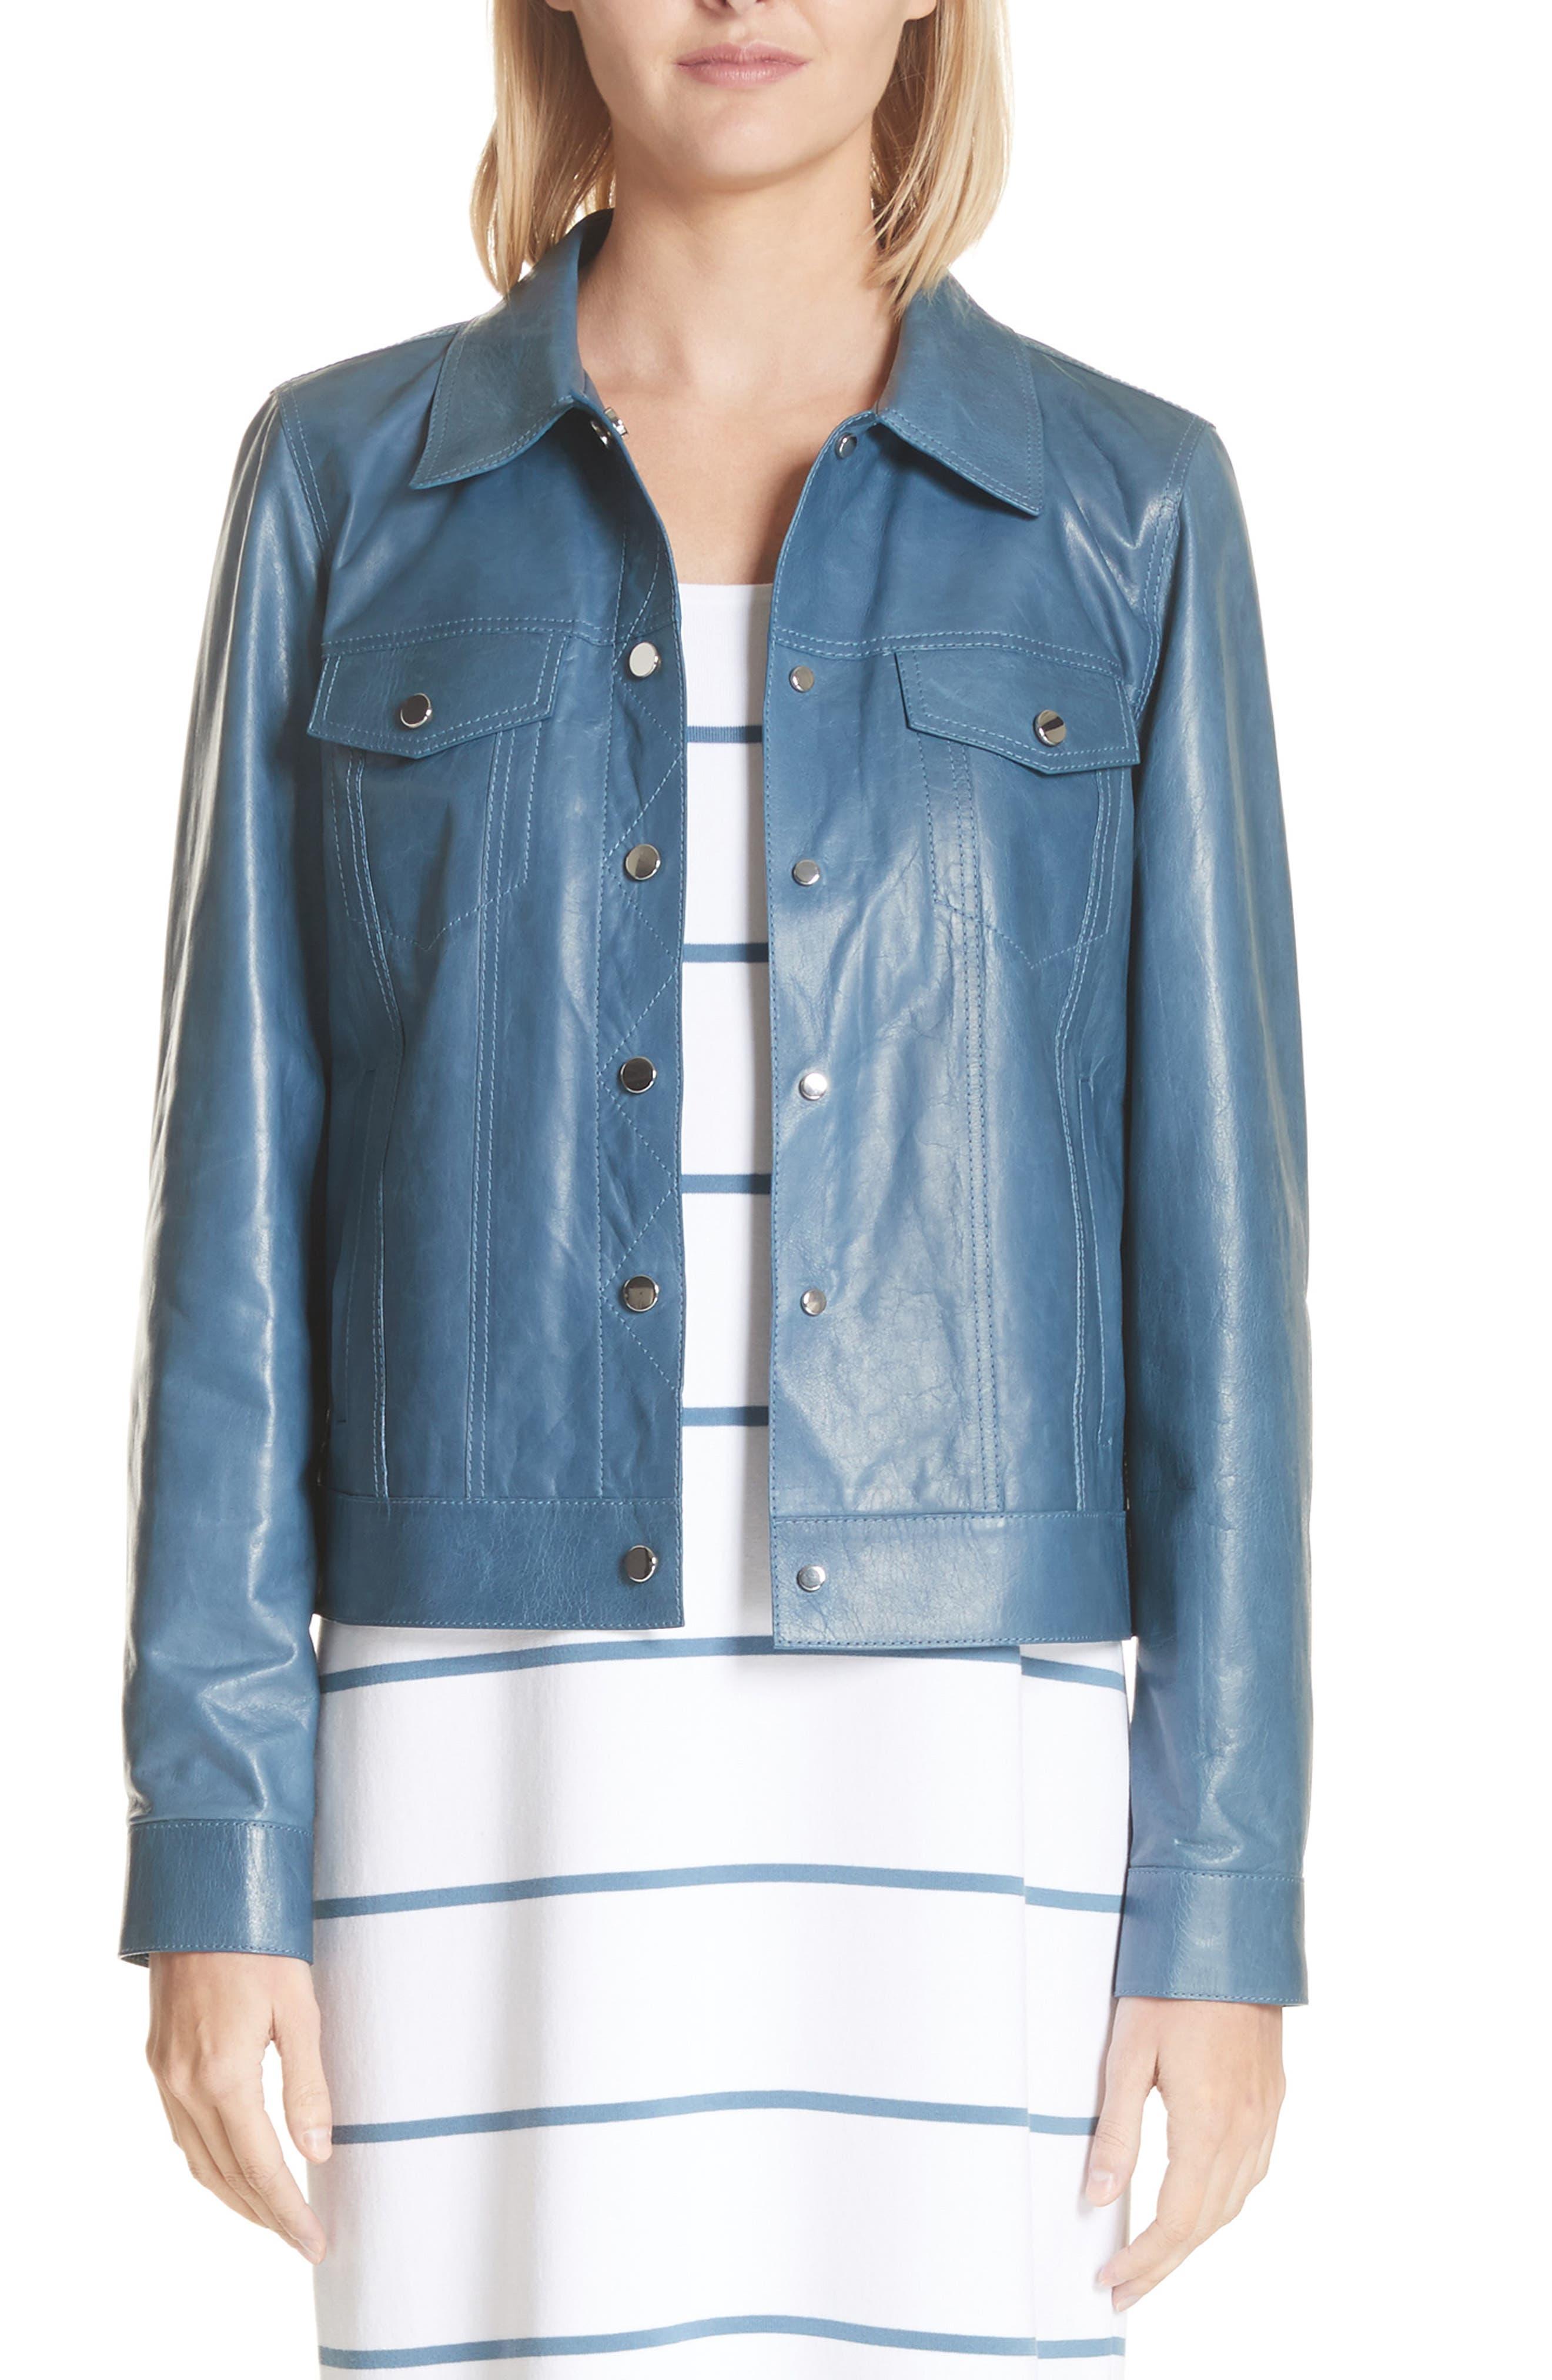 Destiny Leather Jacket,                         Main,                         color, 480